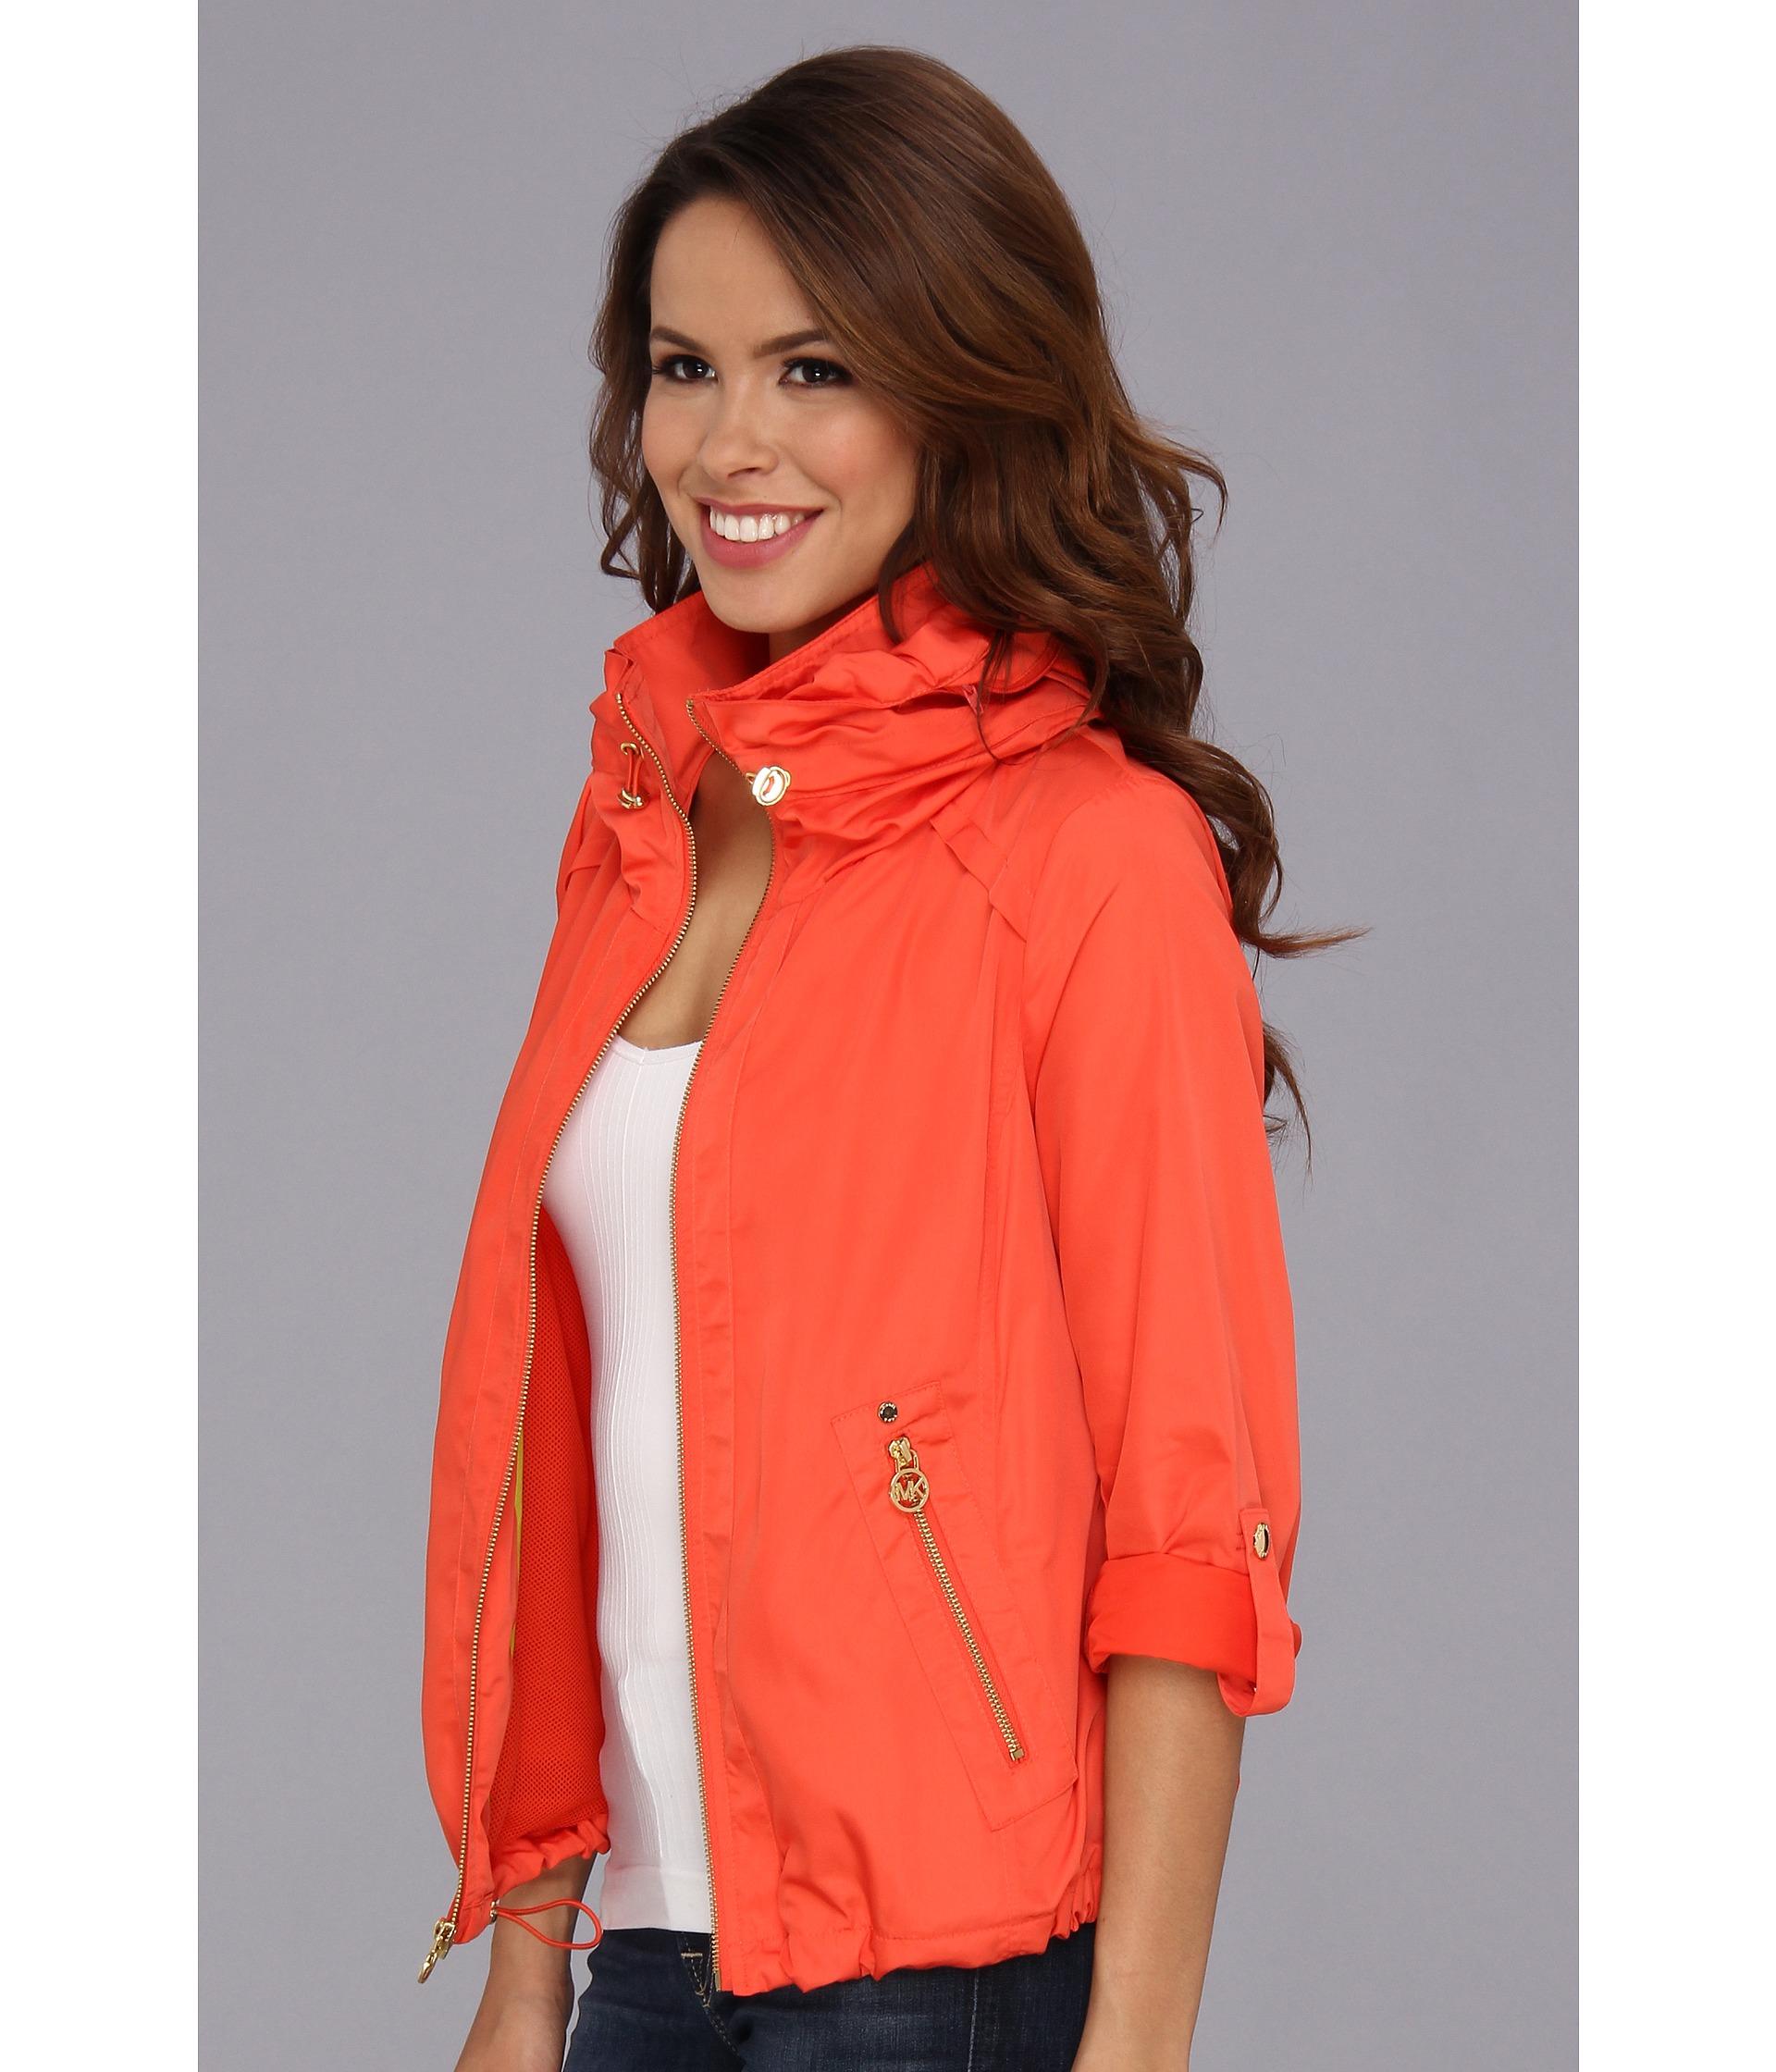 Michael michael kors Blouson Jacket in Orange   Lyst